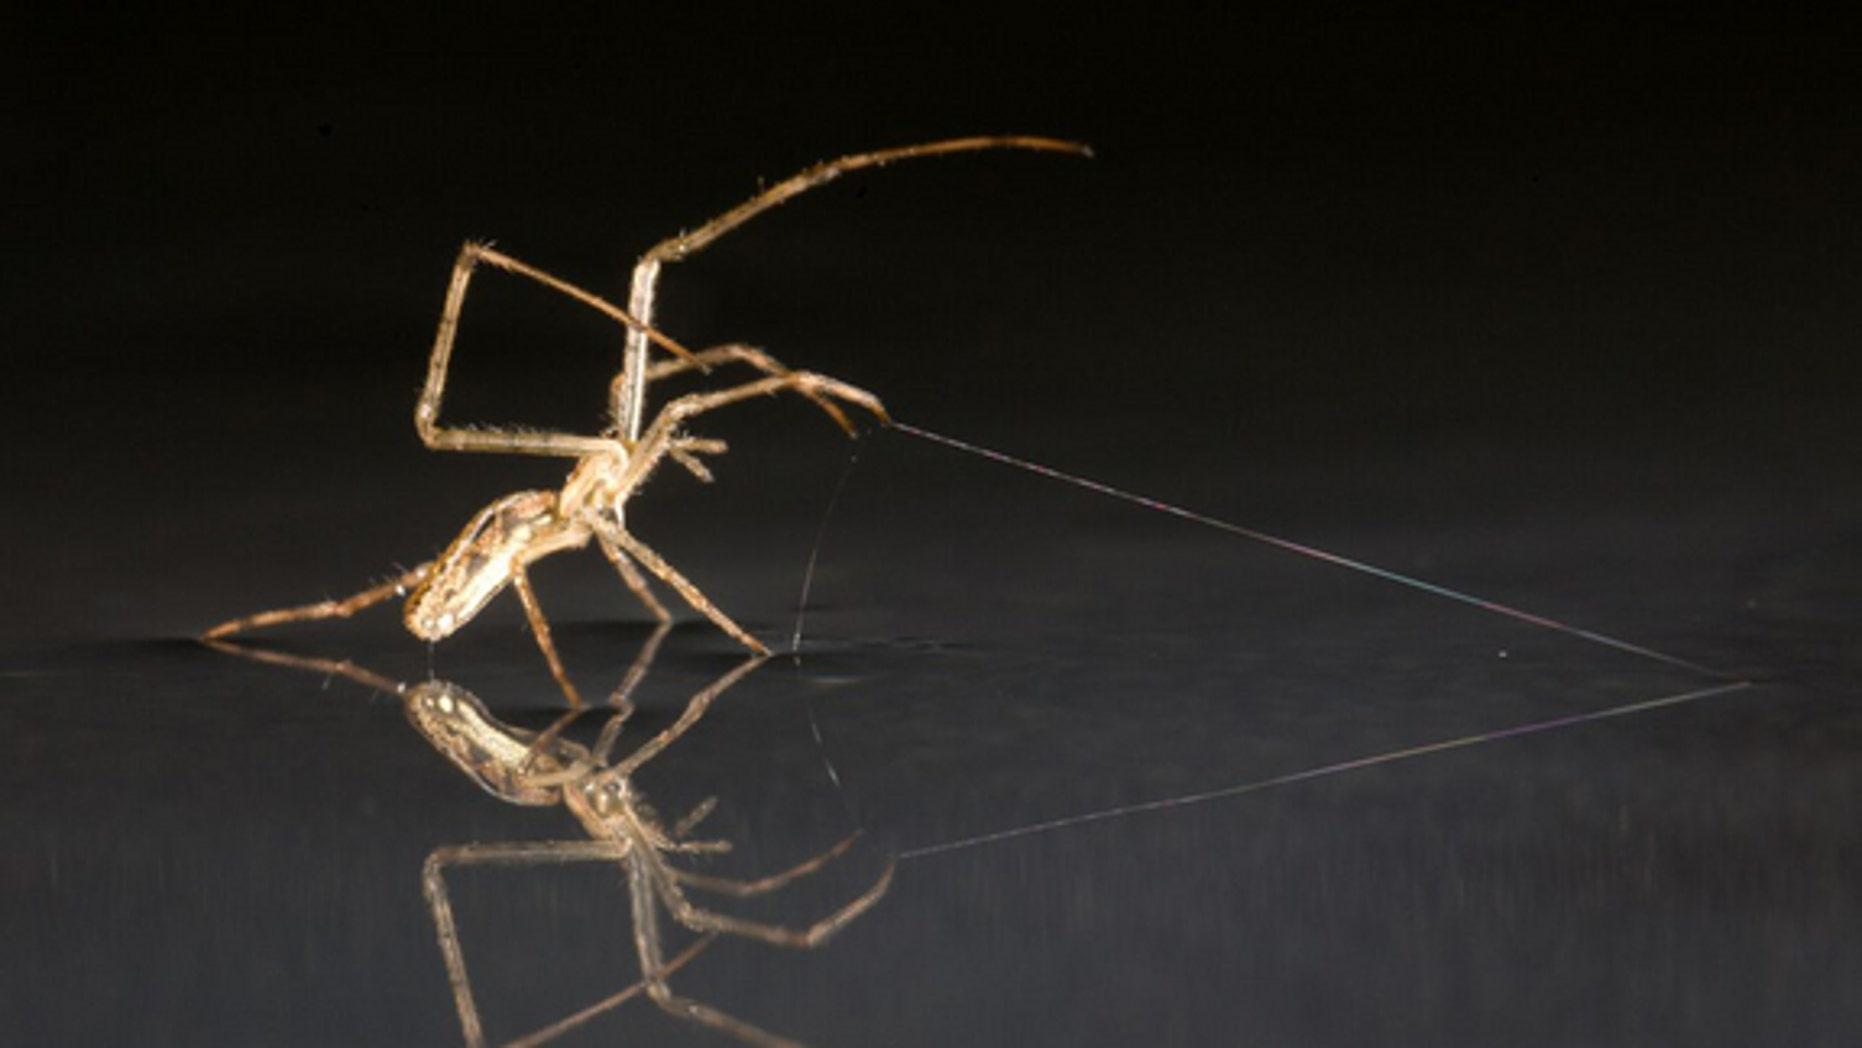 Tetragnathid spider using silk as anchor.